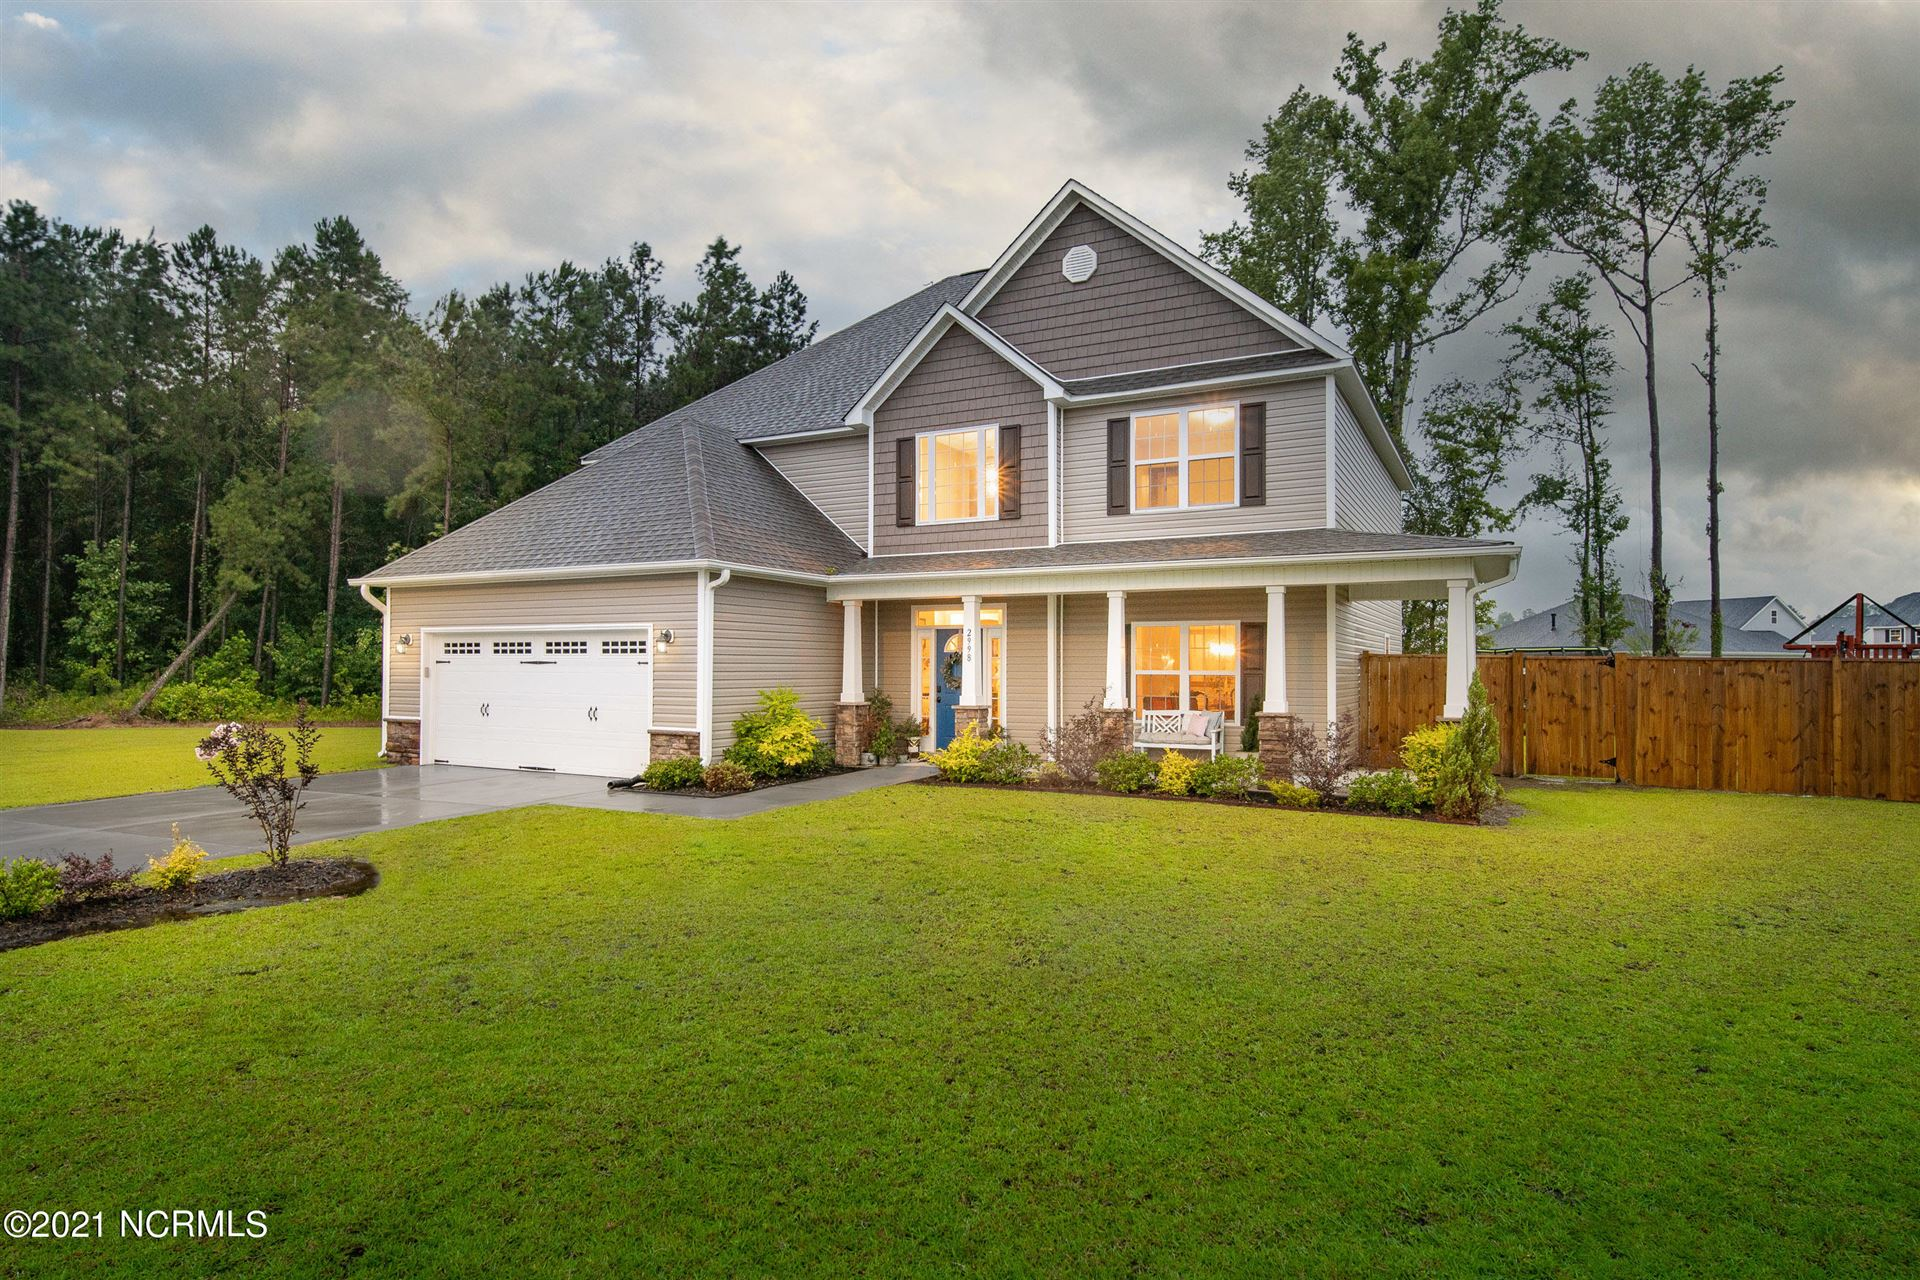 Photo of 2998 Fox Glove Drive, Winterville, NC 28590 (MLS # 100284778)